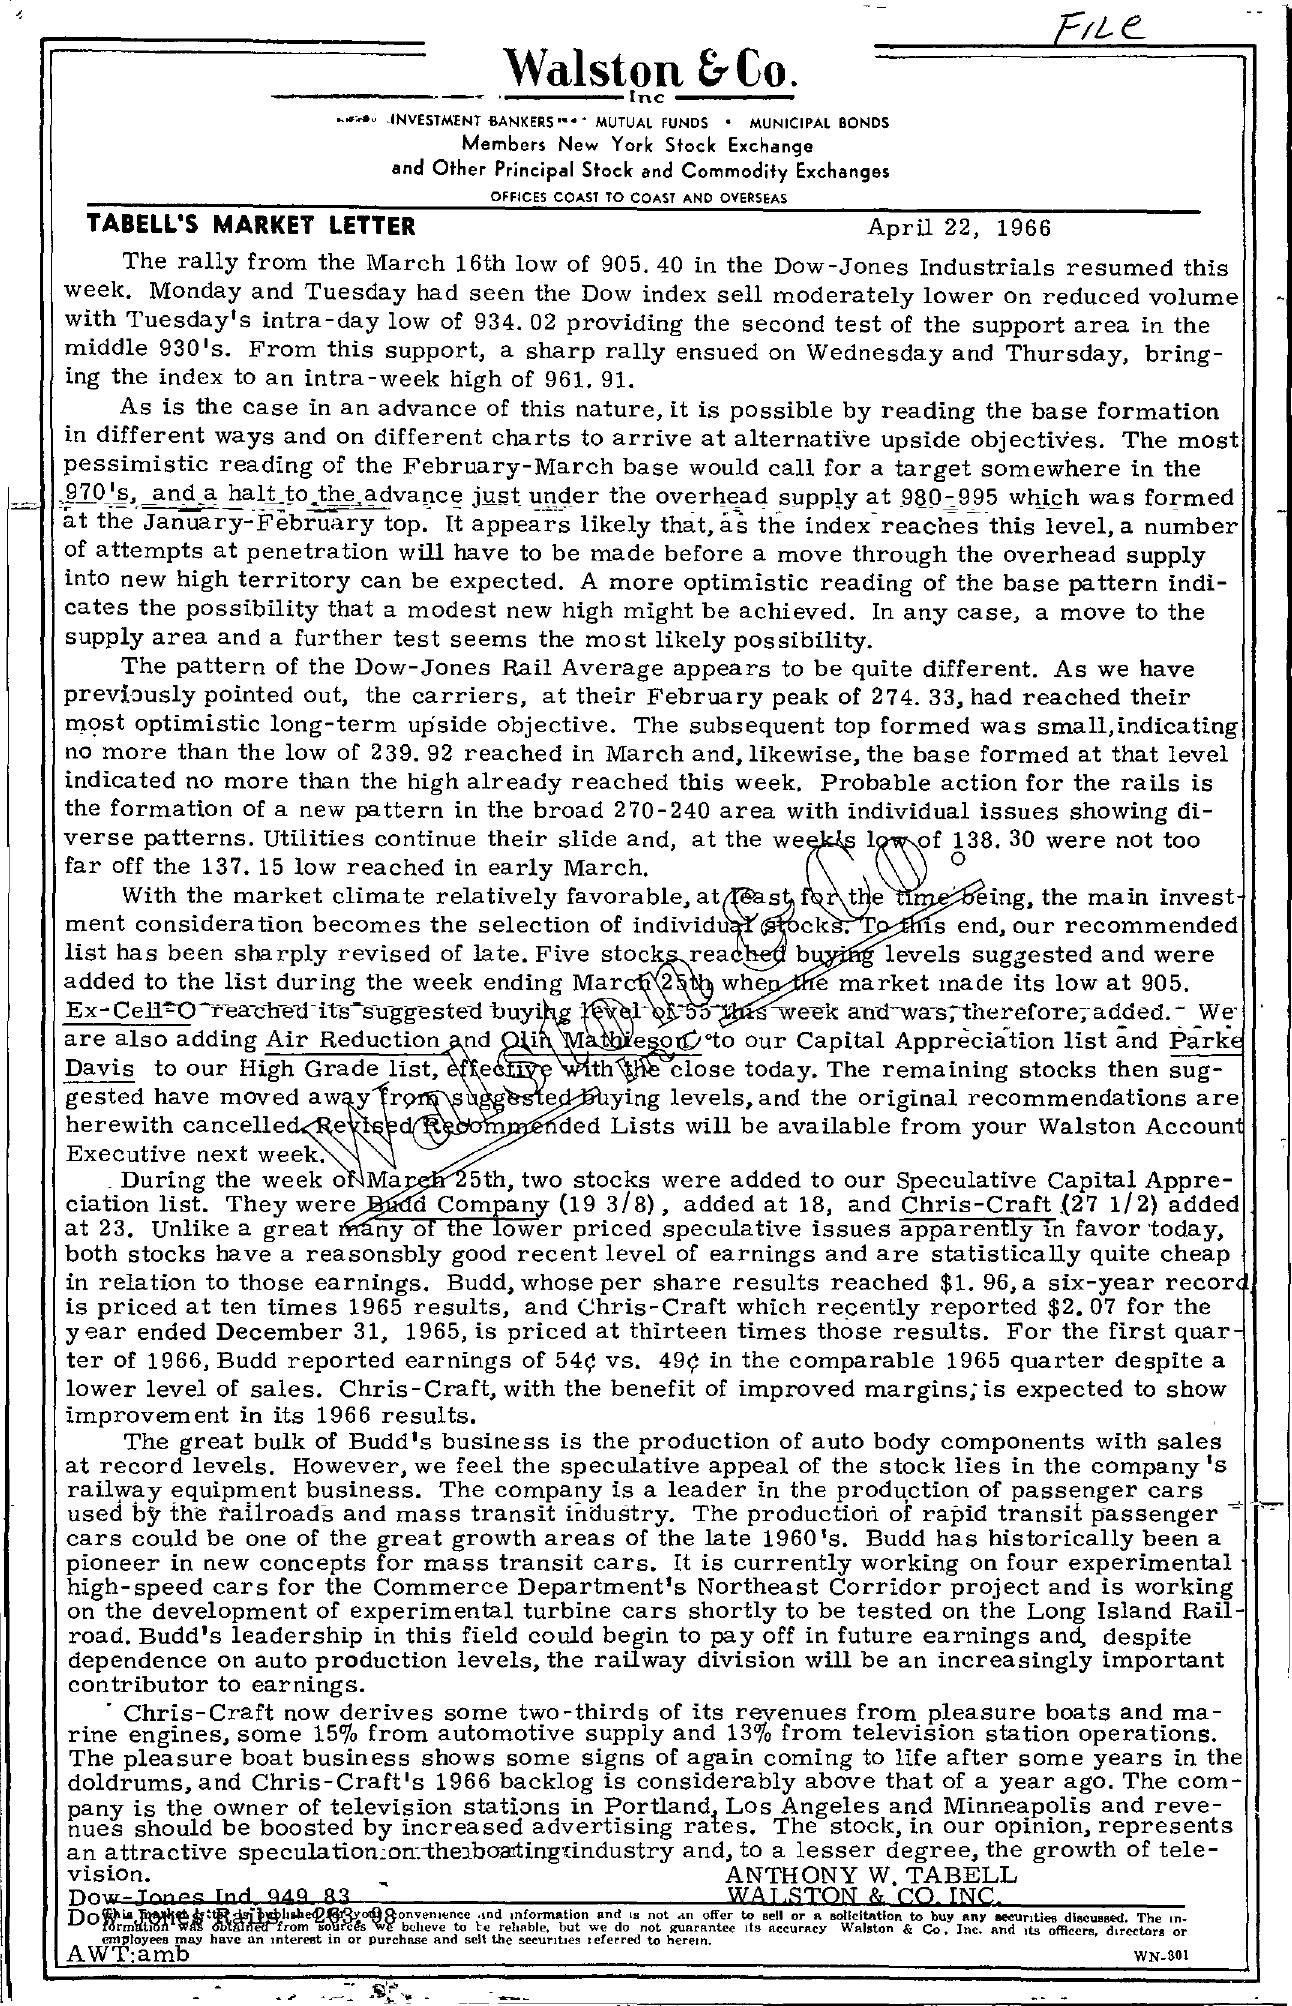 Tabell's Market Letter - April 22, 1966